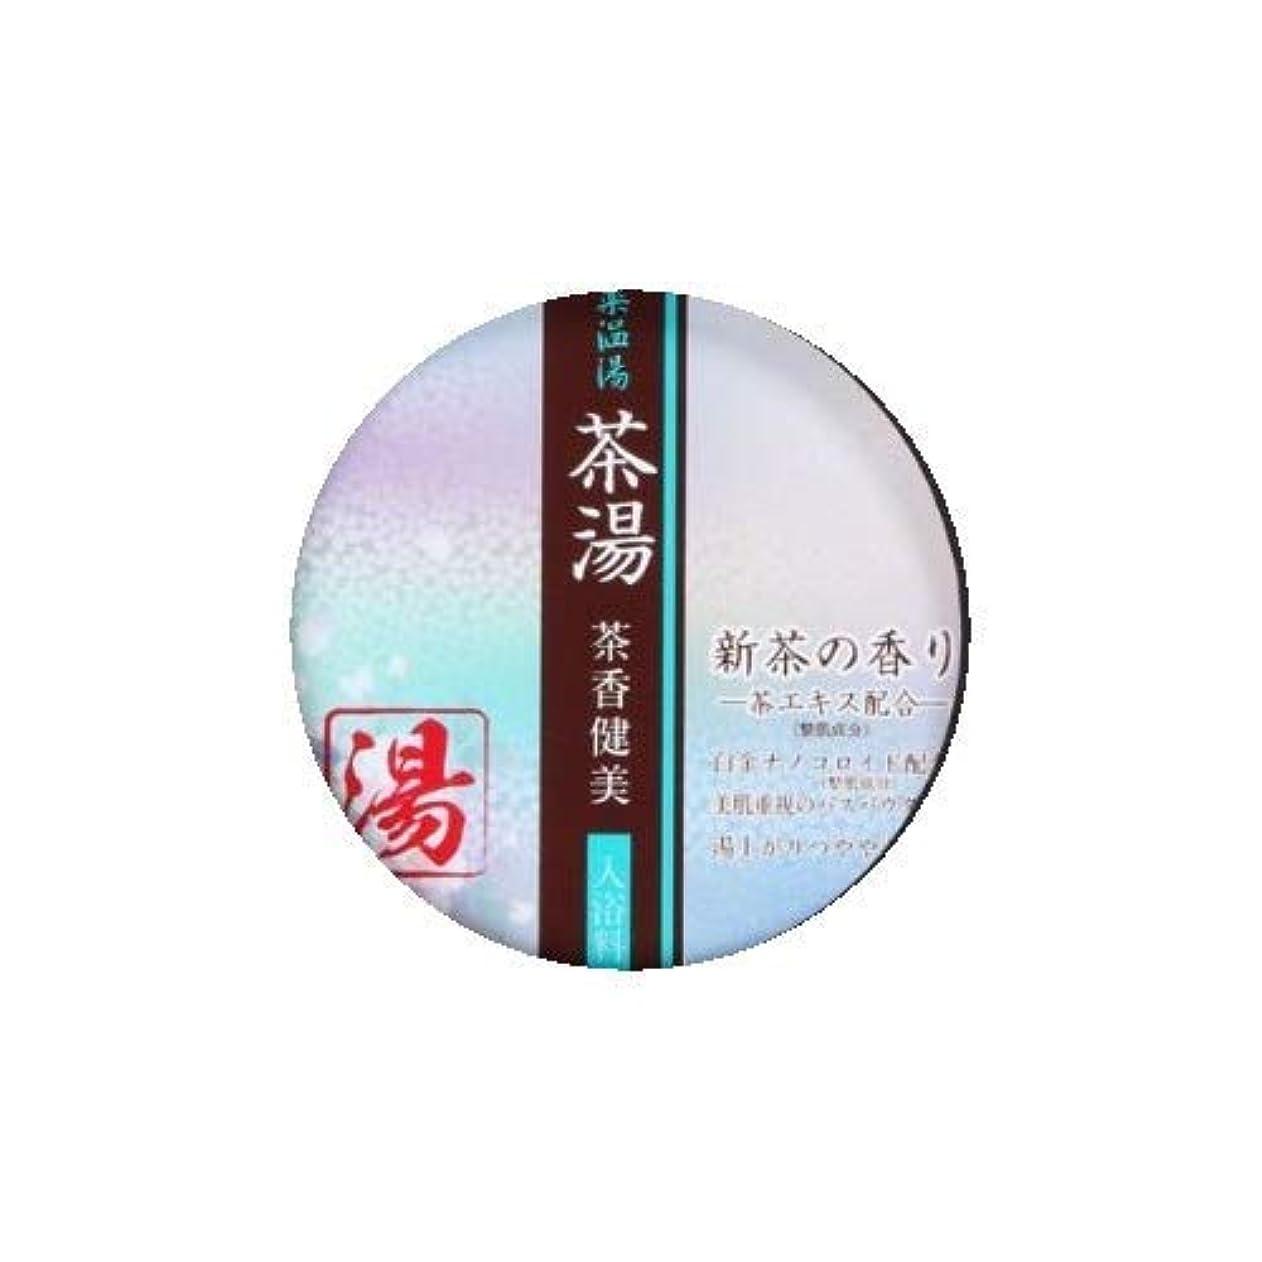 指植生第五薬温湯 茶湯 入浴料 新茶の香り POF-10S